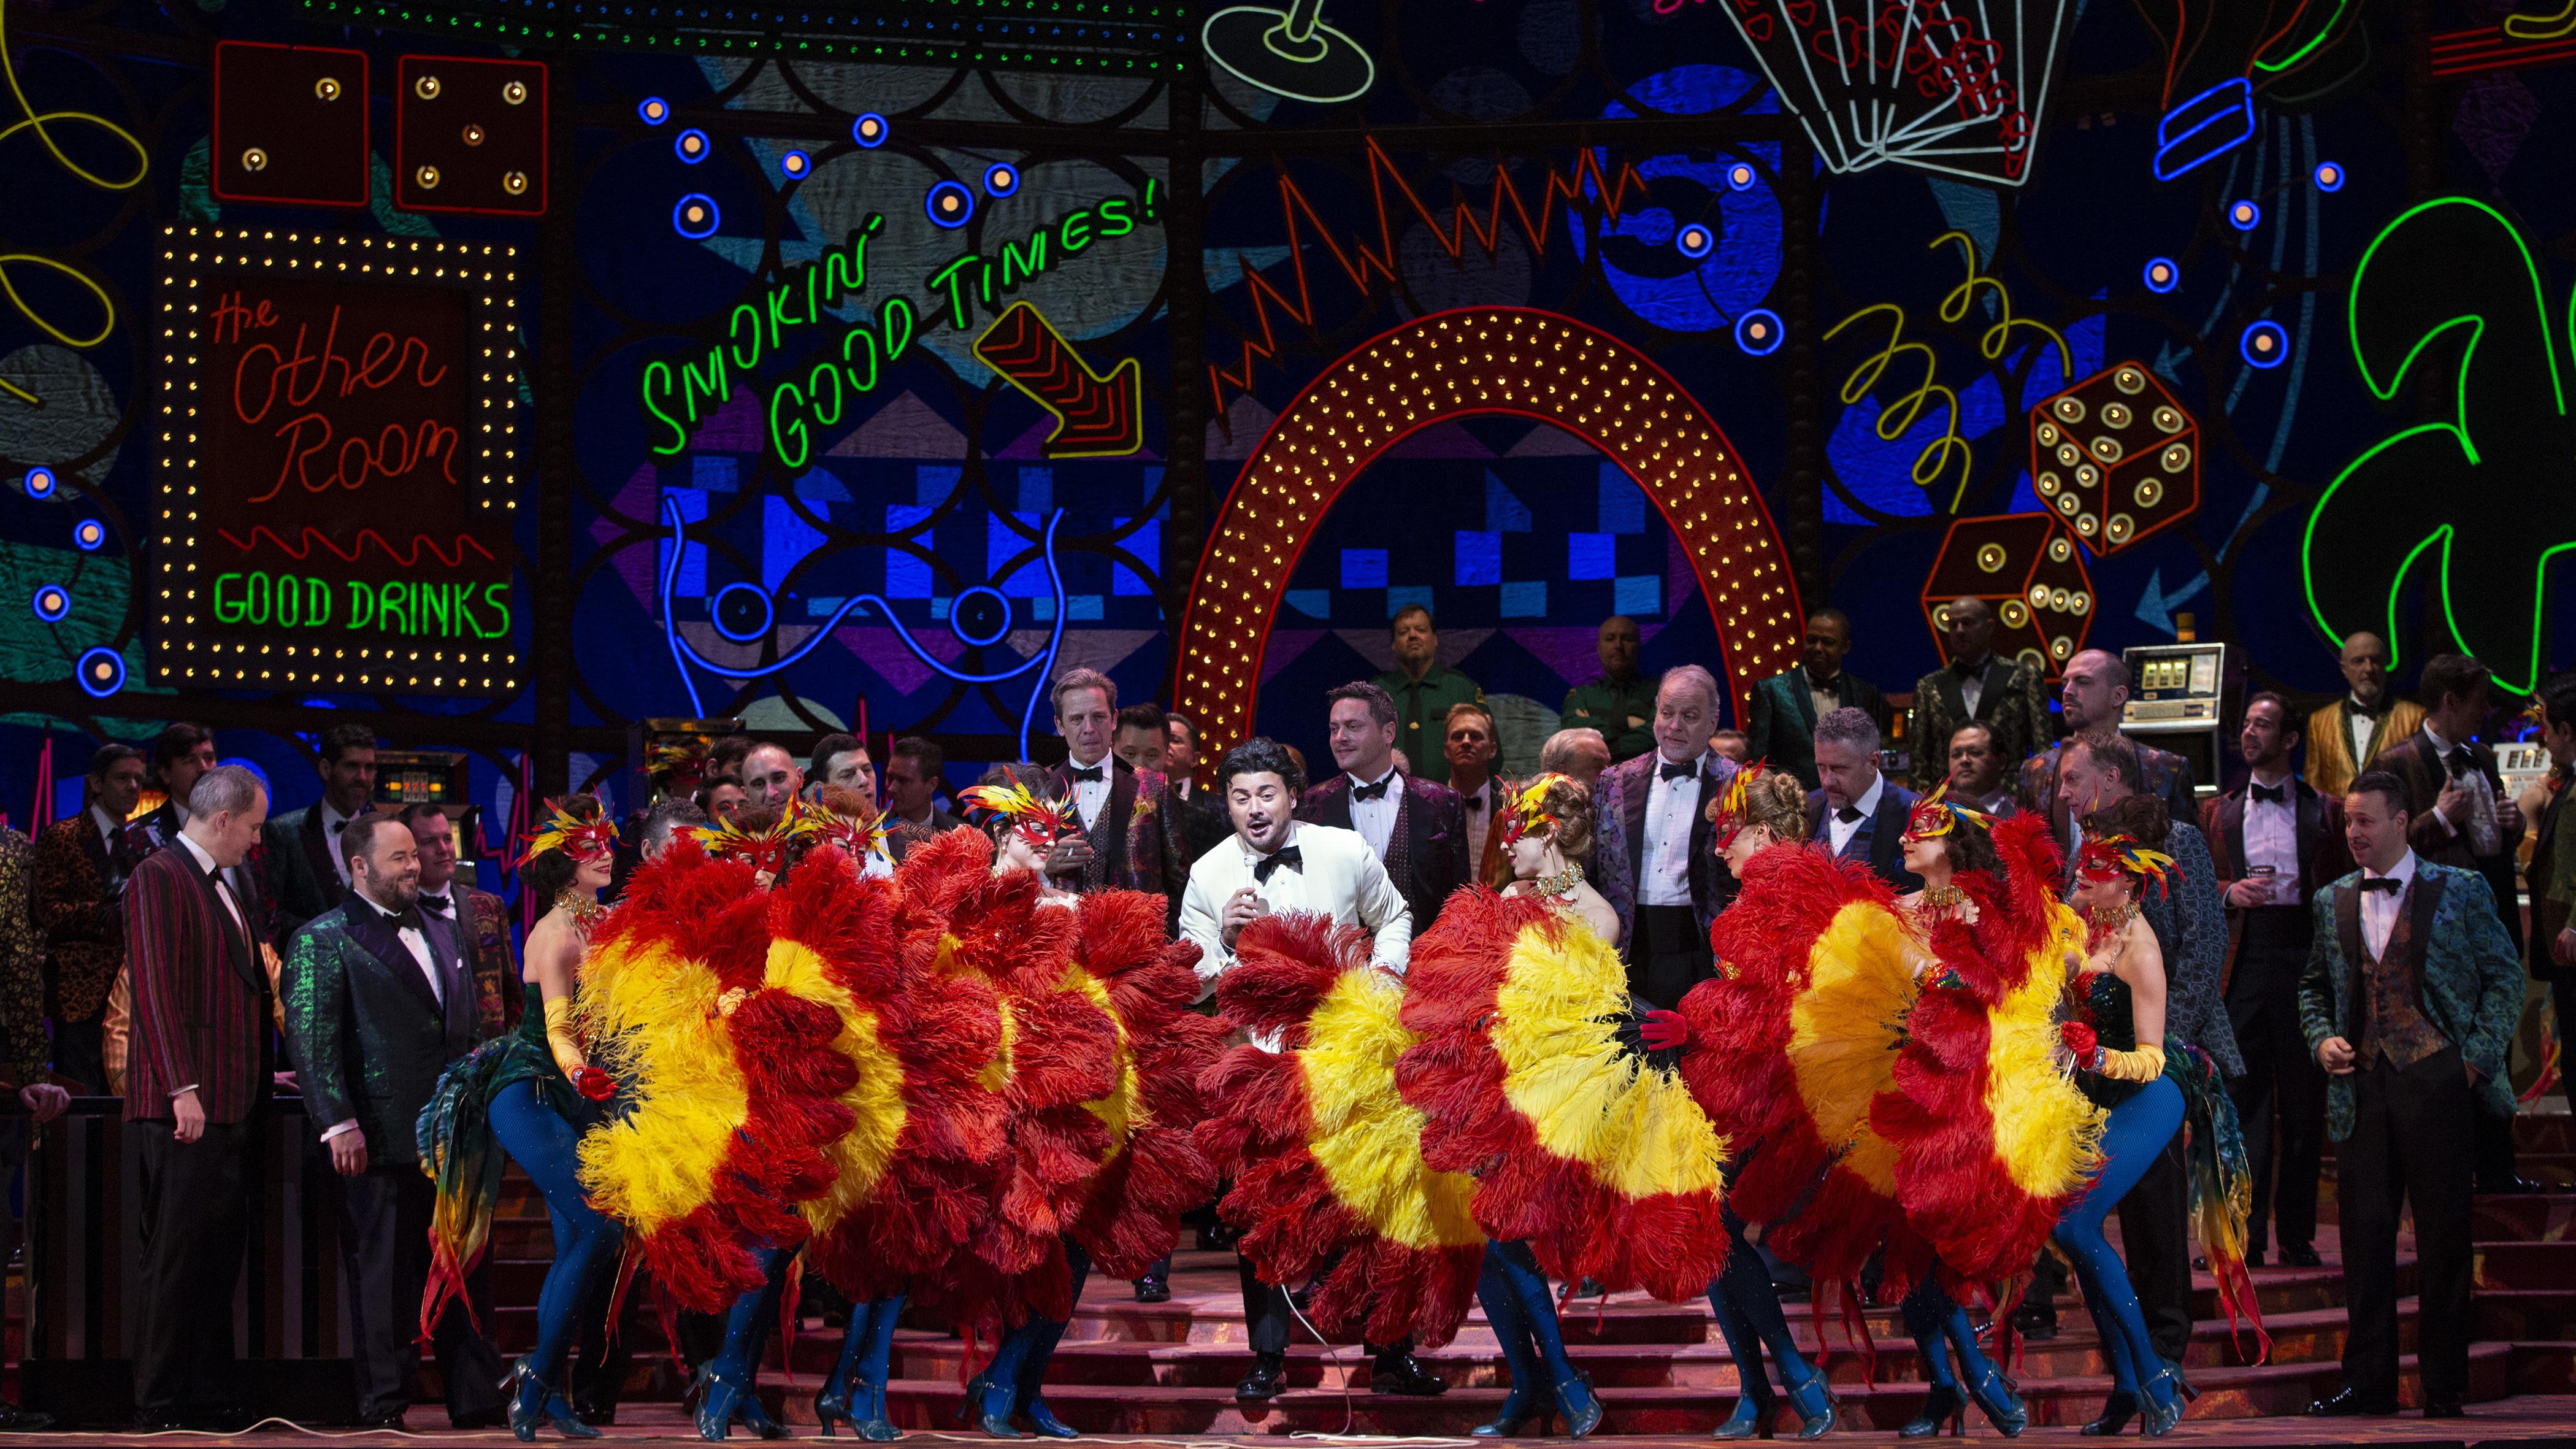 'Rigoletto' In Vegas And The Pleasures Of The Metropolitan Opera